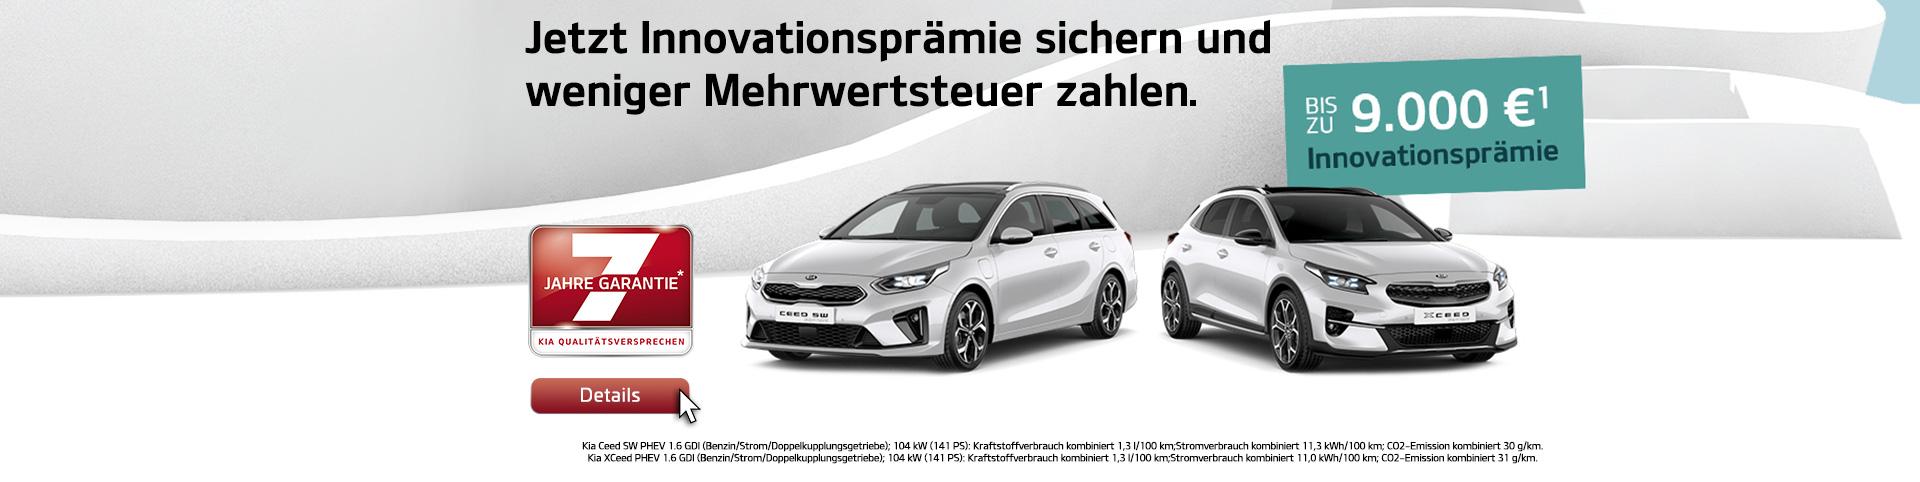 KIA Innovationsprämie für Elektrofahrzeuge und Plug-in-Hybrid-Modelle